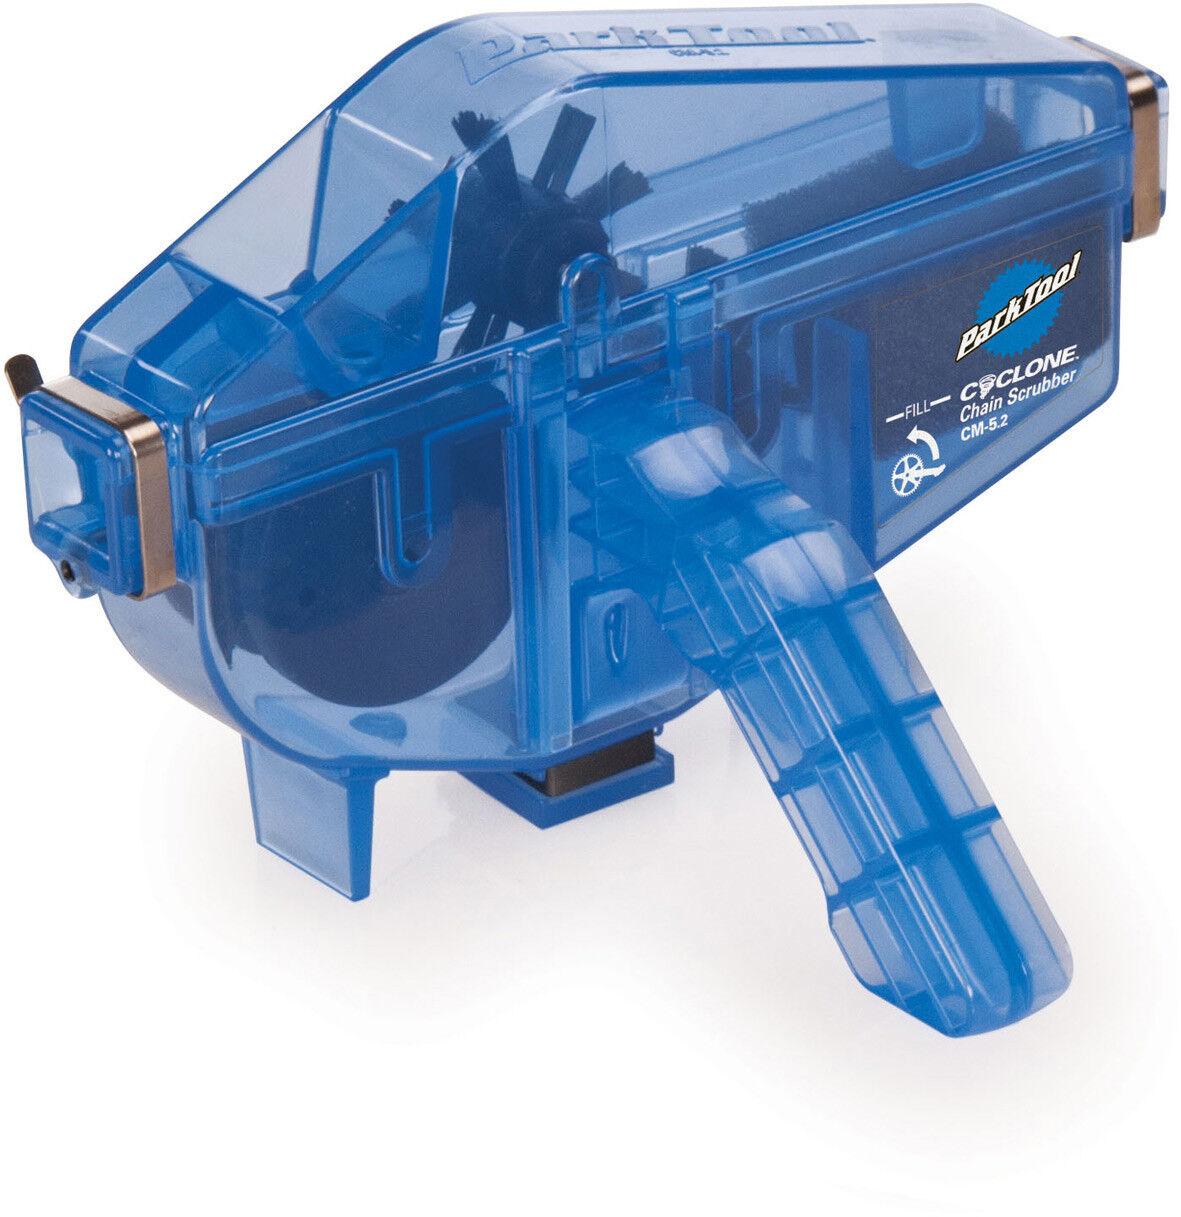 Park Tool CM-5.2 - Cyclone Chain Scrubber